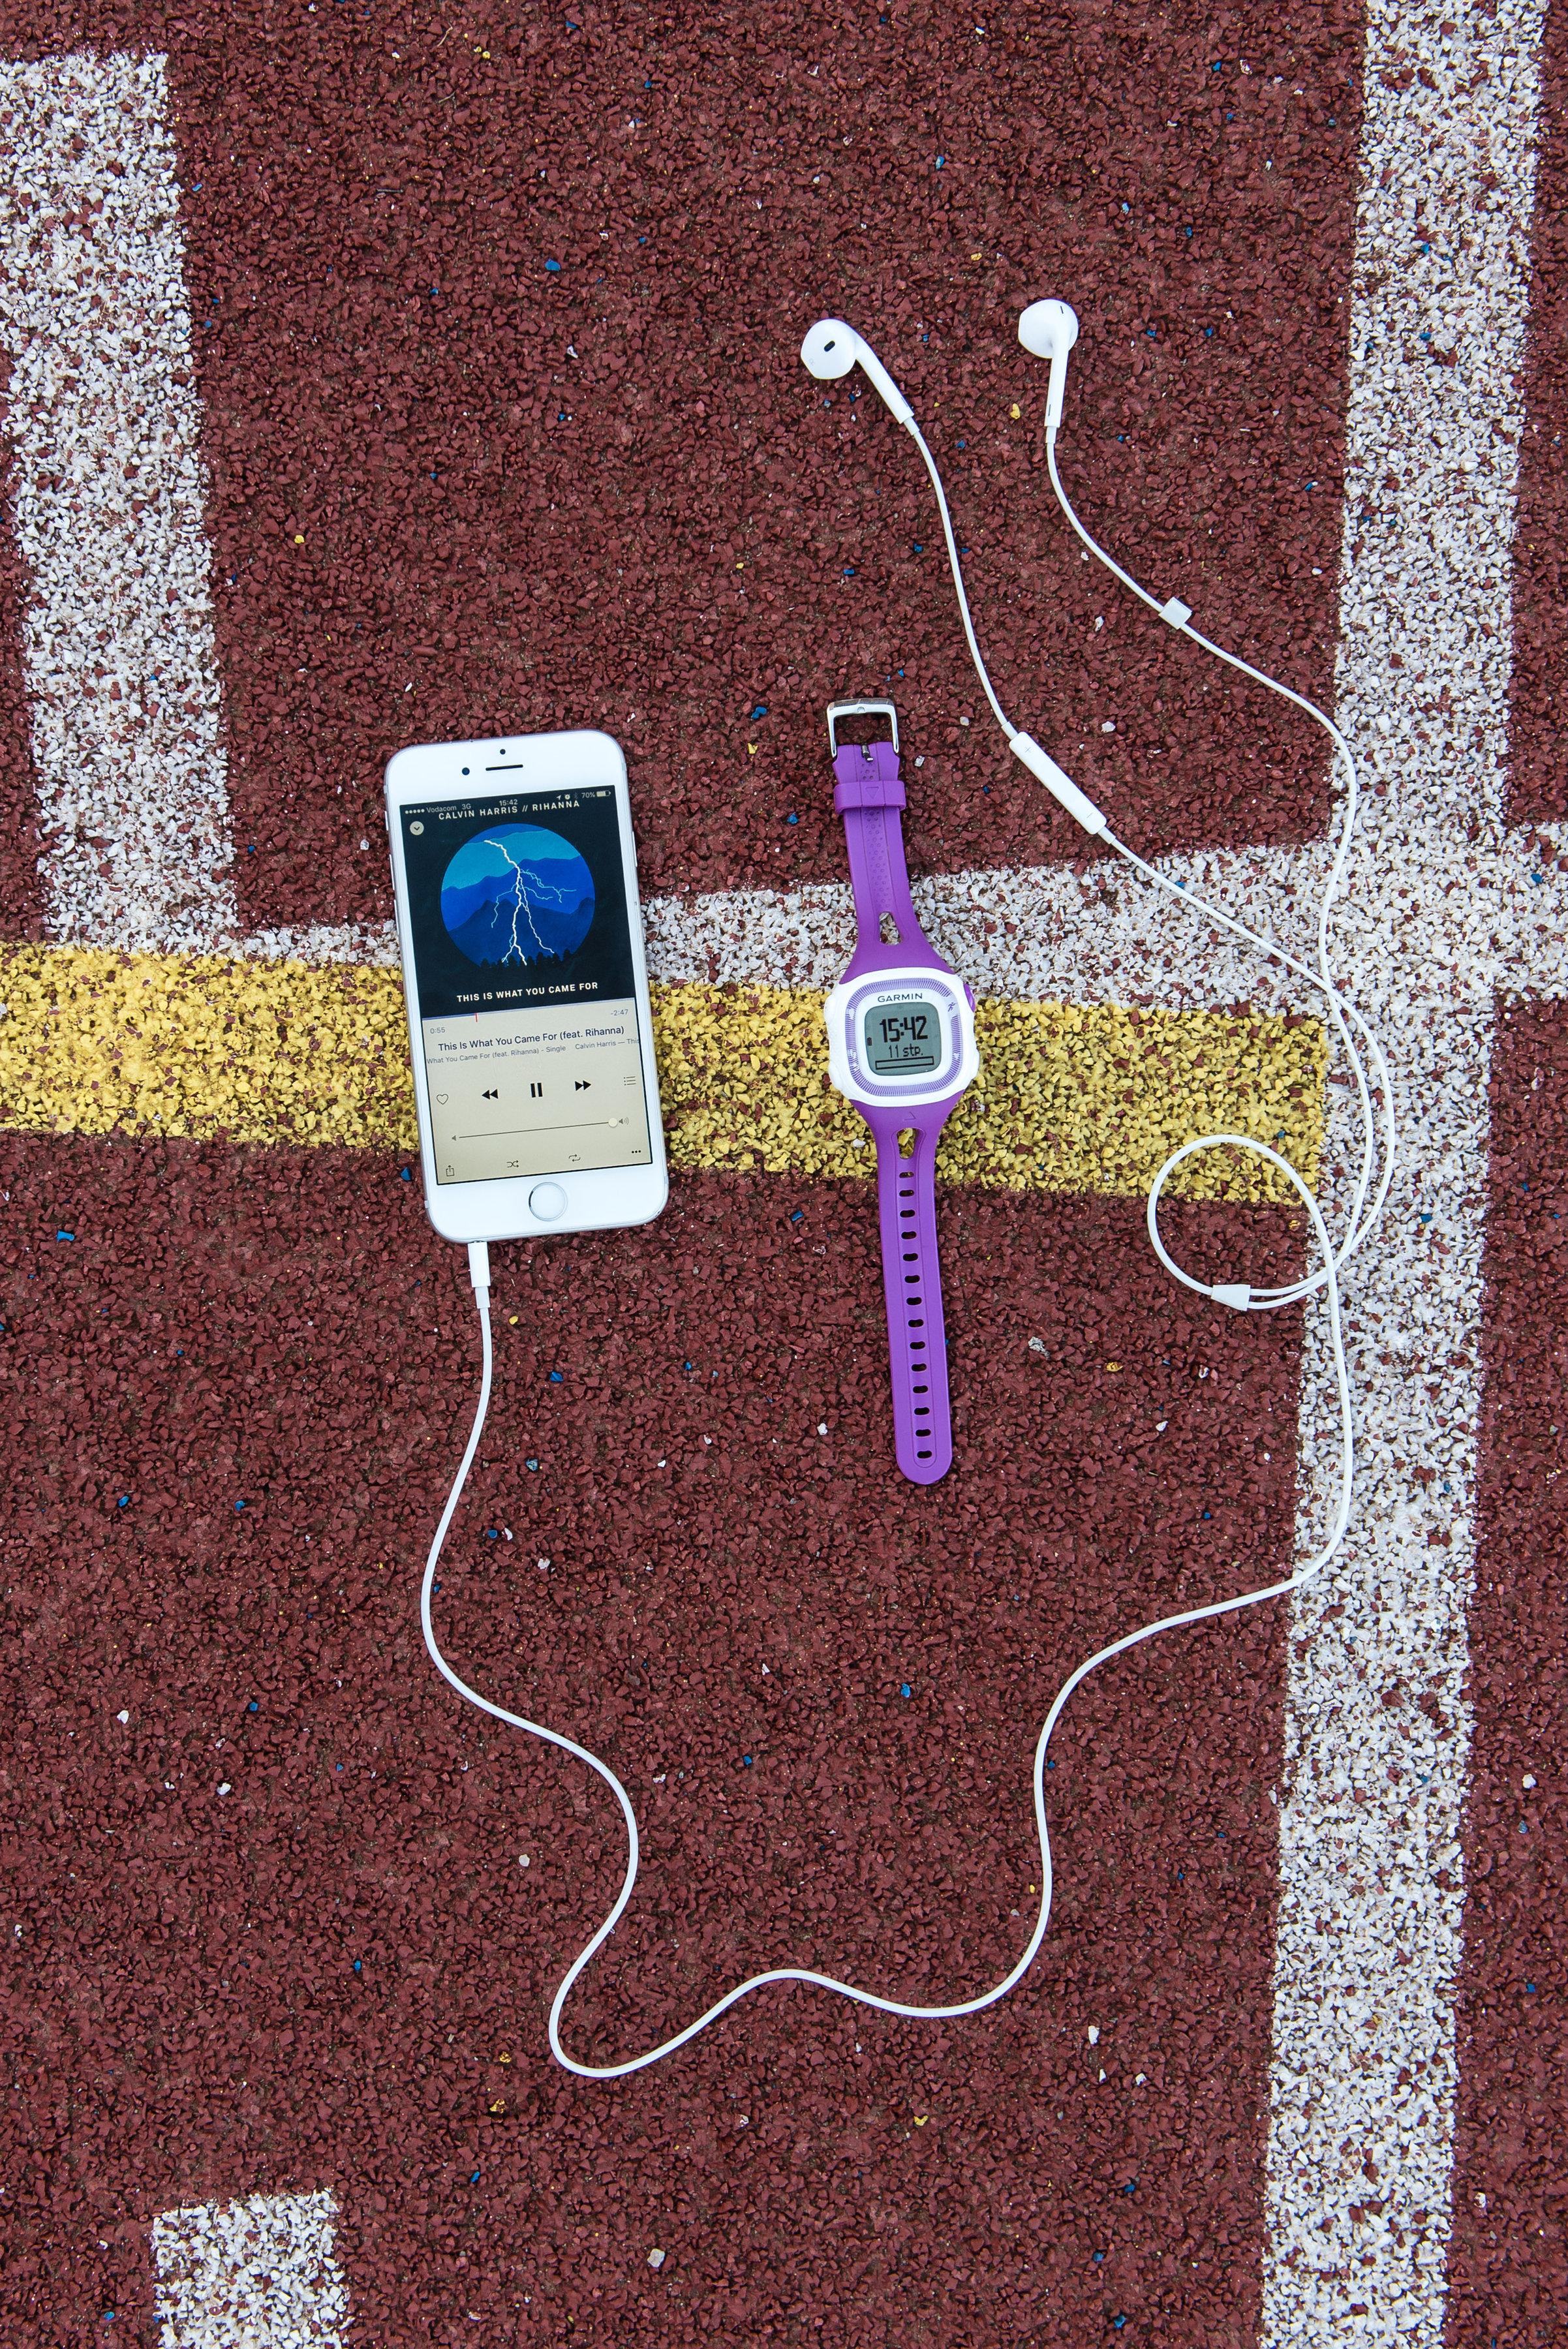 iPhone and Garmin Forerunner 15